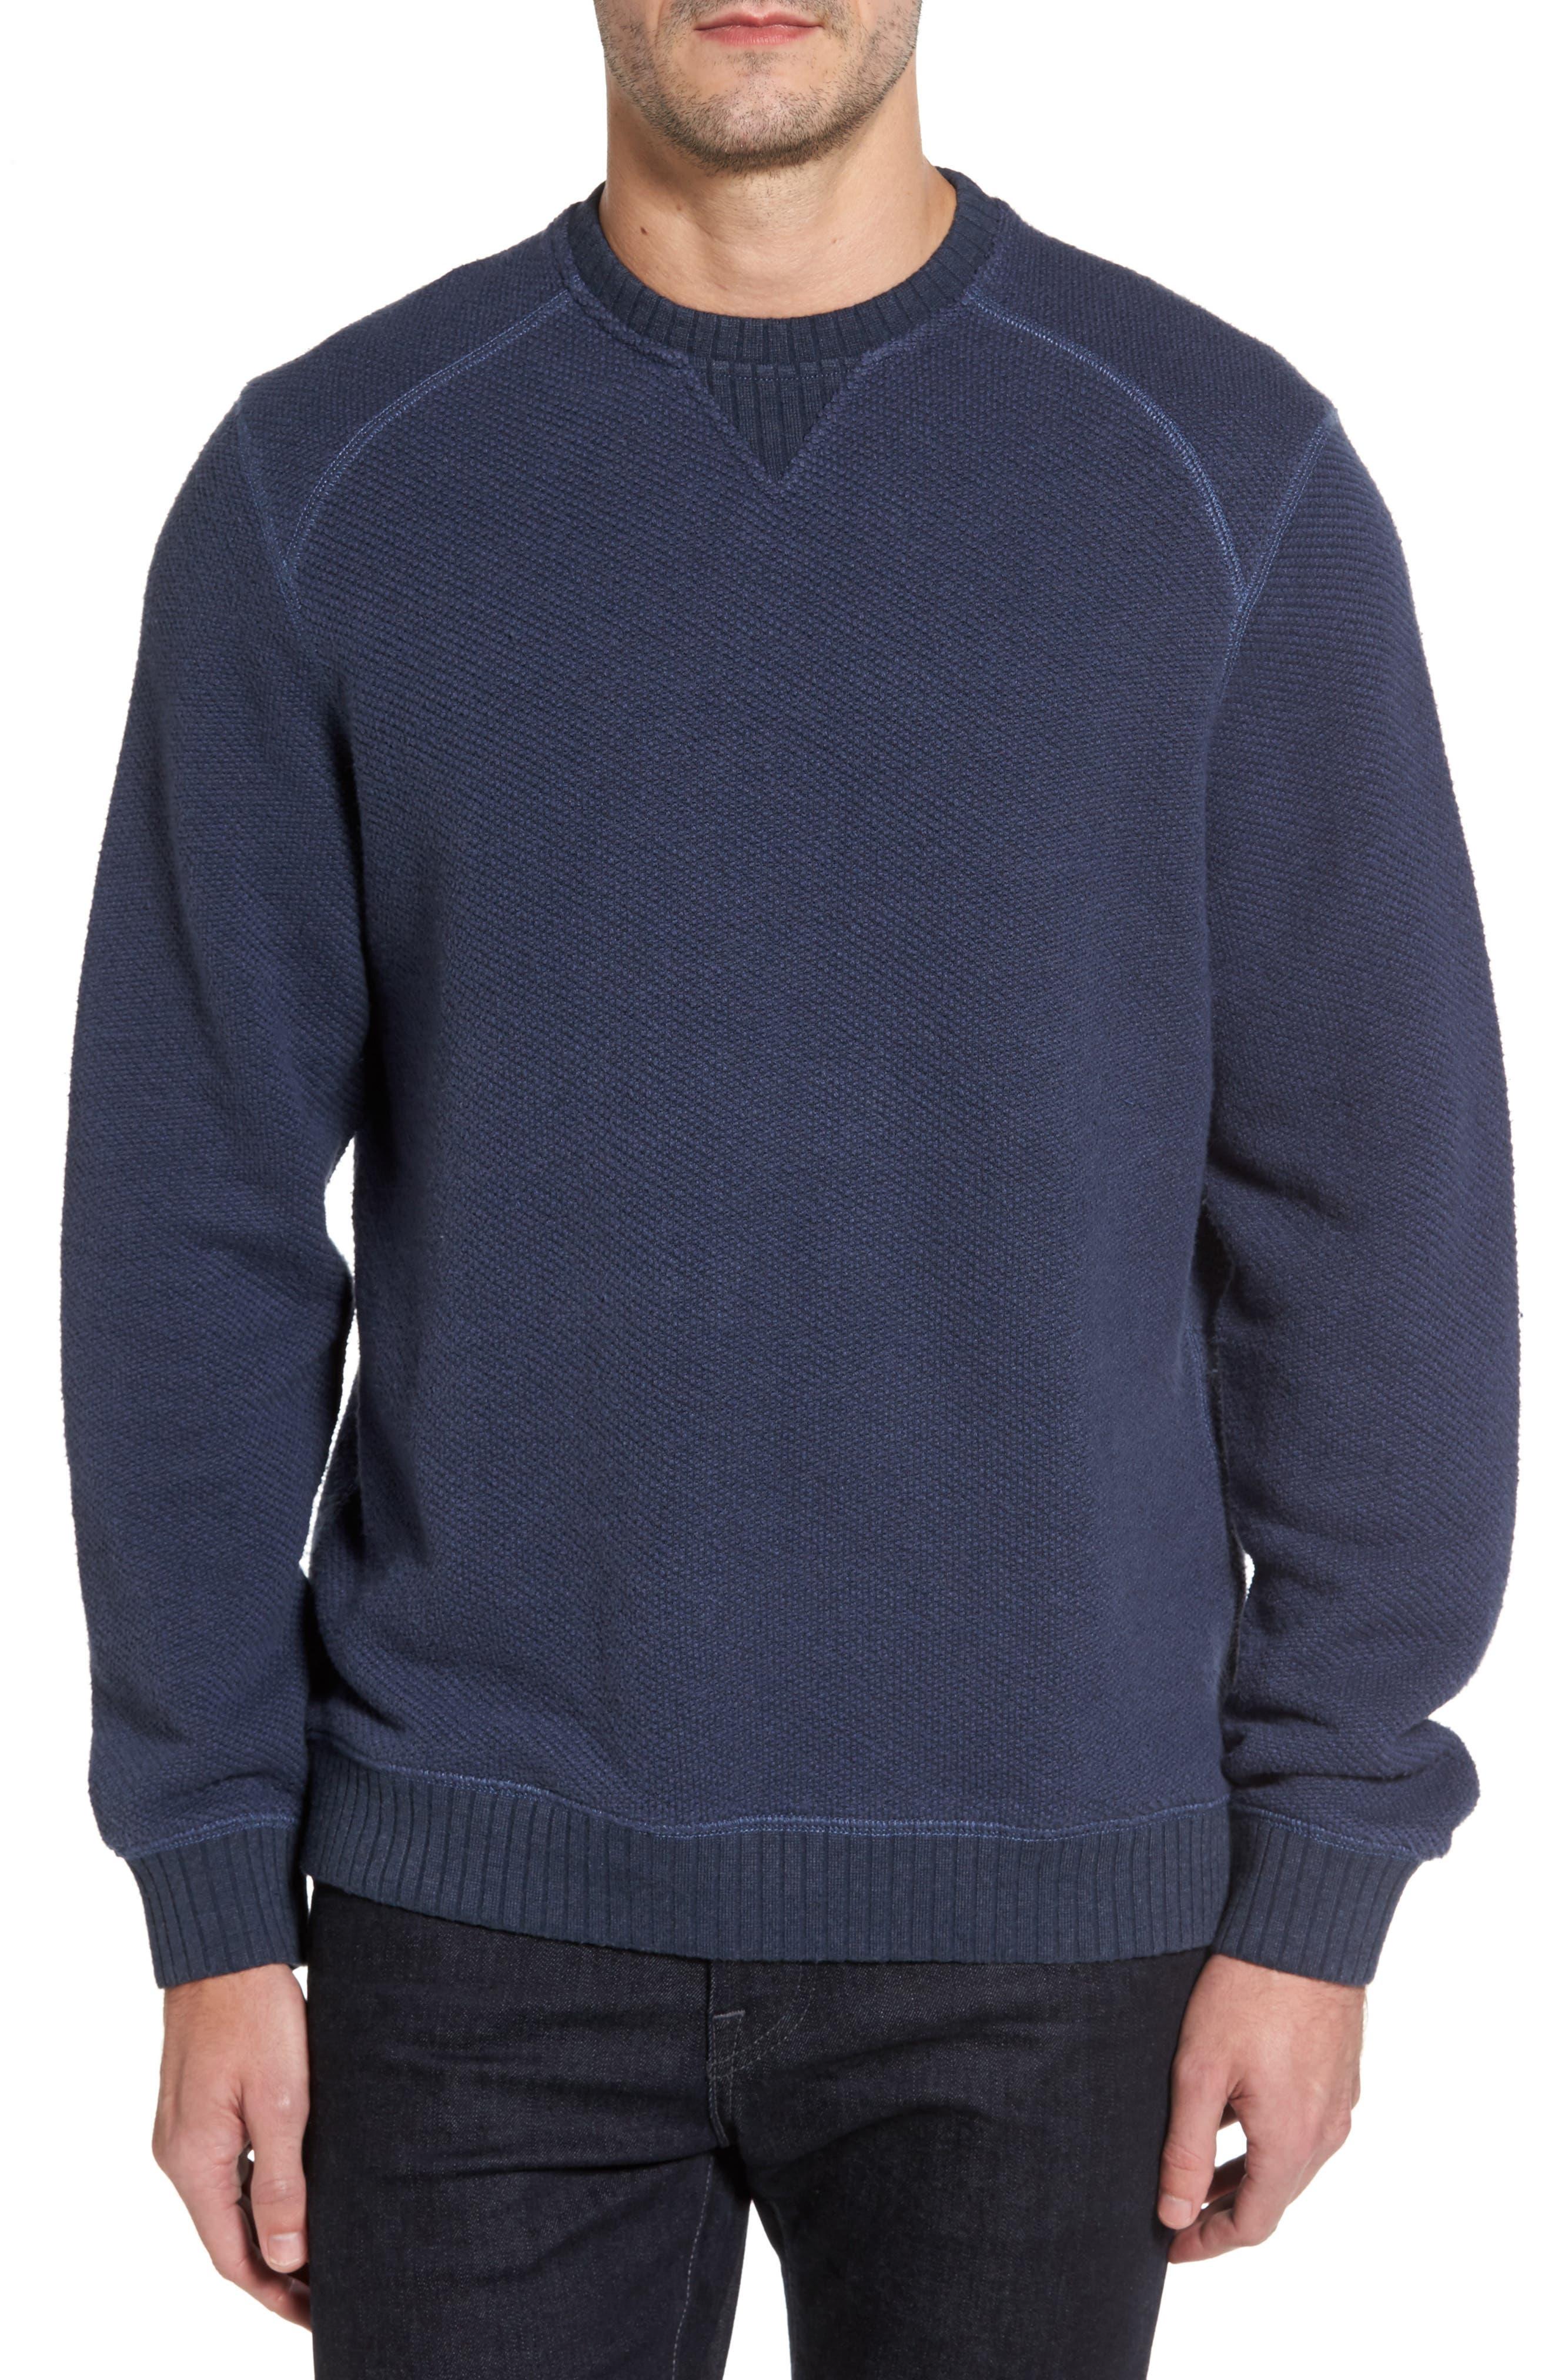 Alternate Image 1 Selected - Tommy Bahama Surfari Crewneck Sweatshirt